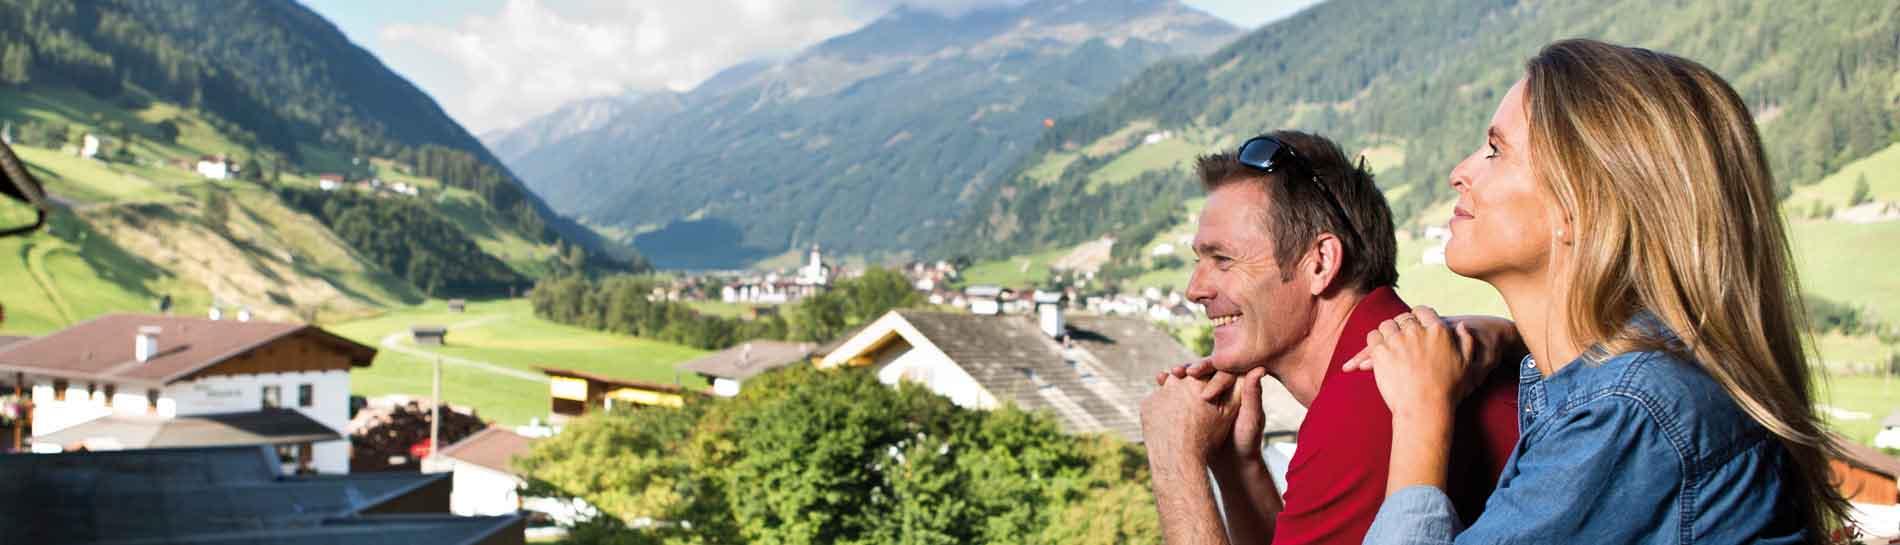 Happy_Stubai_Hotel_Hostel_Neustift_Stubaital_Panorama